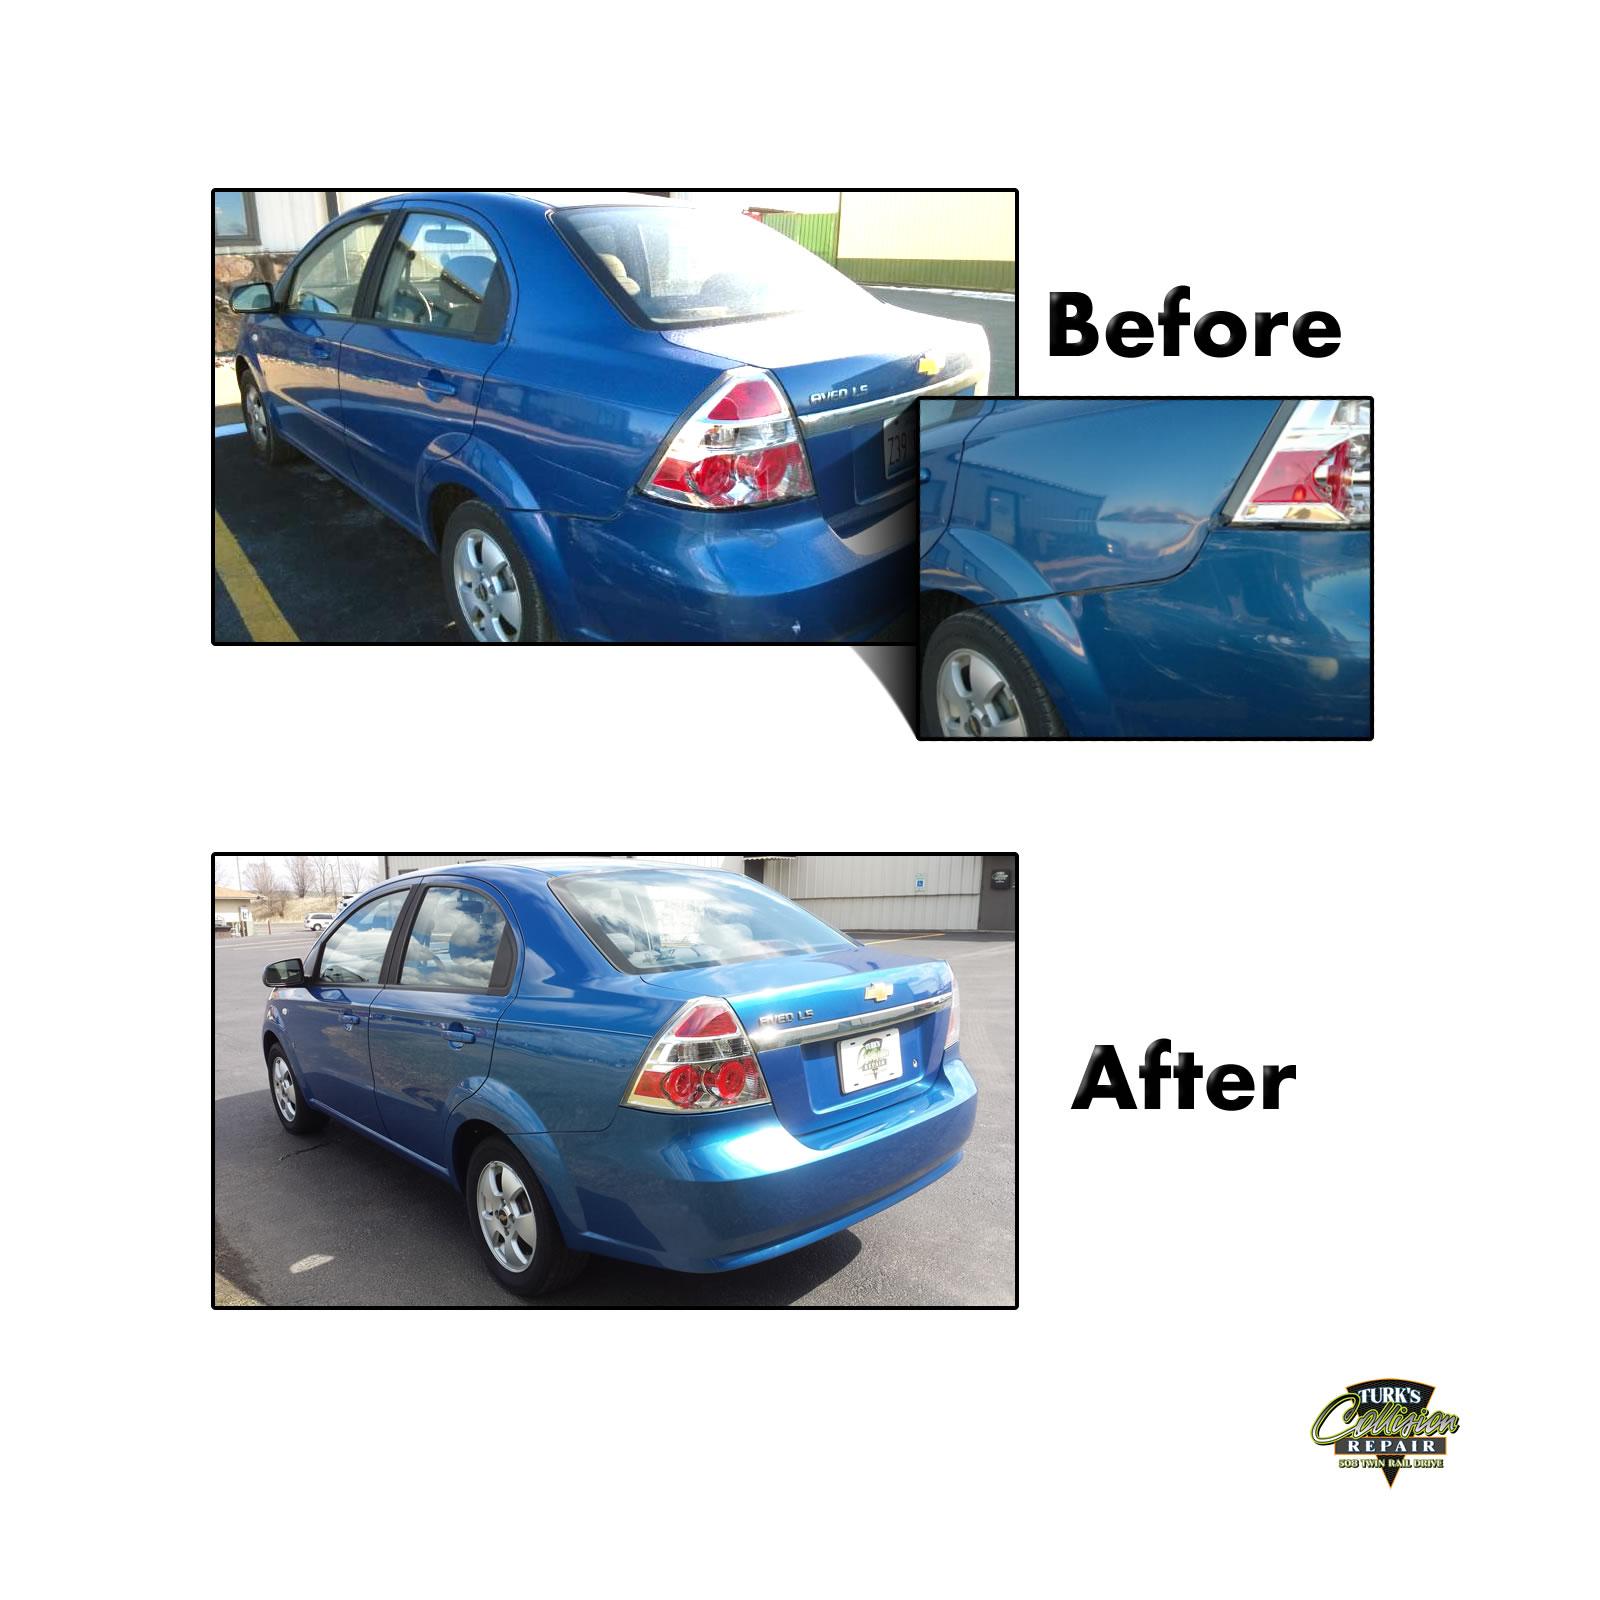 Chevy Aveo Collision Repair